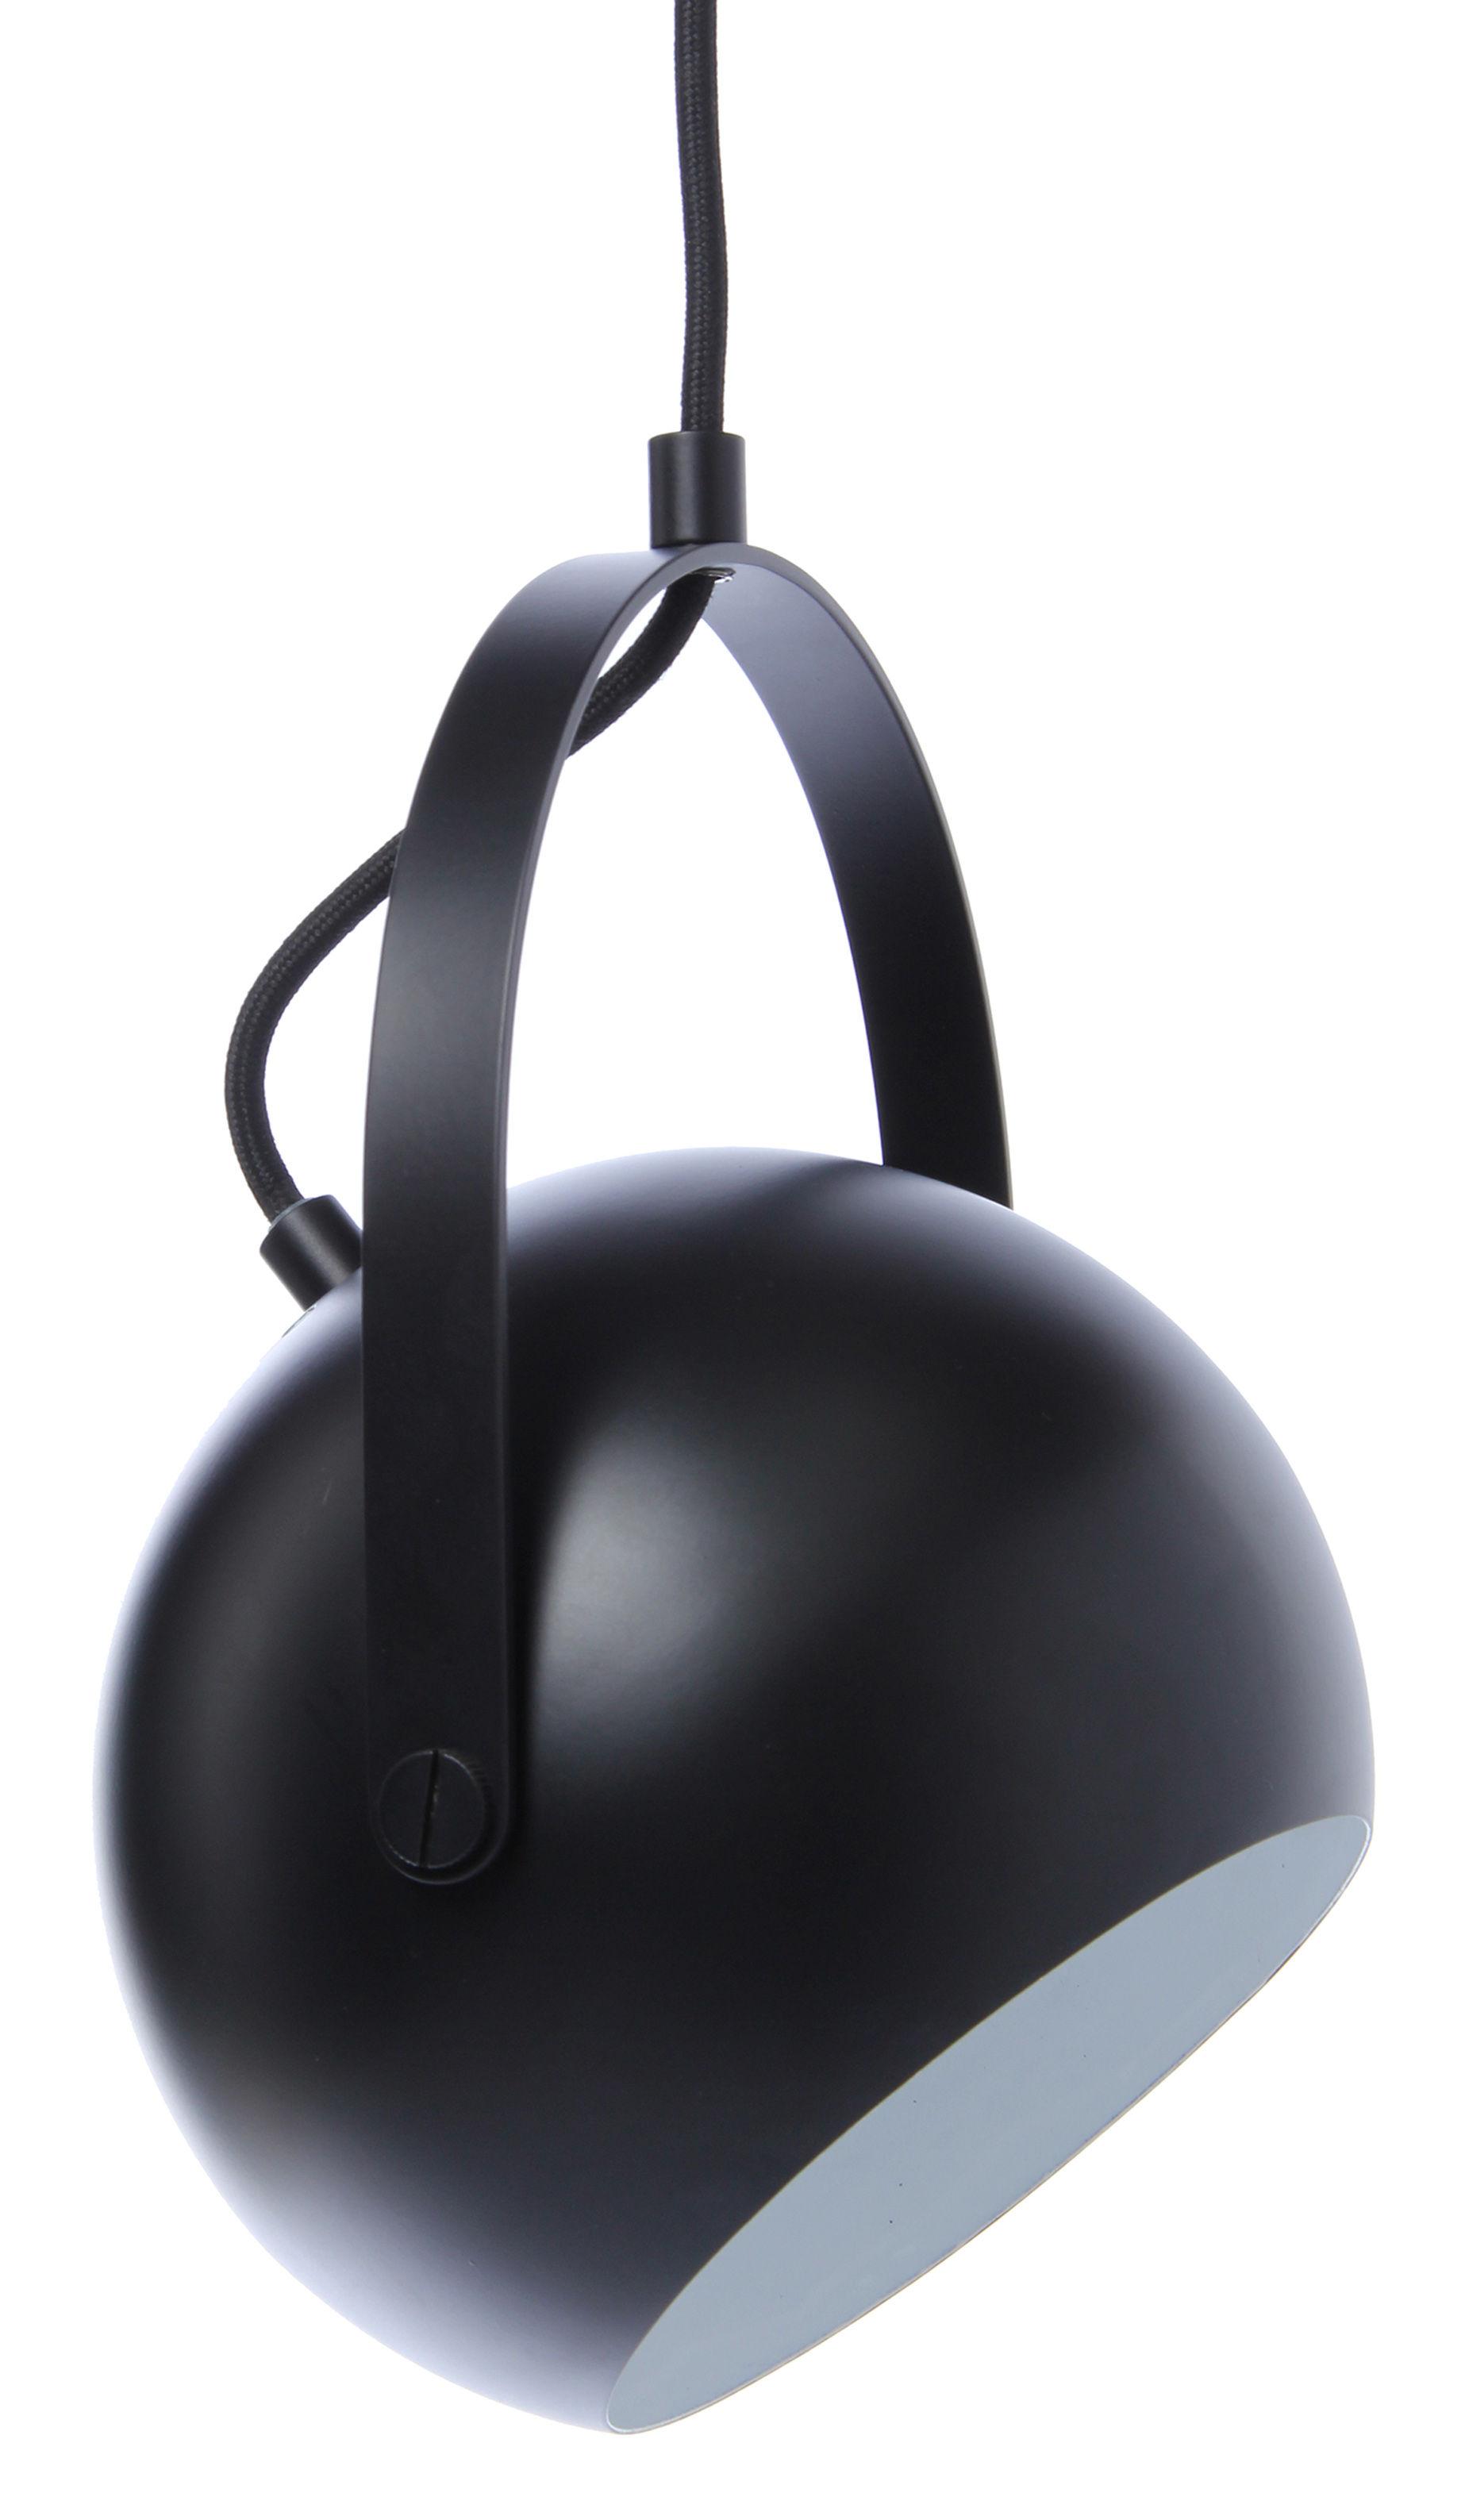 Luminaire - Suspensions - Suspension Ball avec arceau - Frandsen - Noir mat - Métal peint